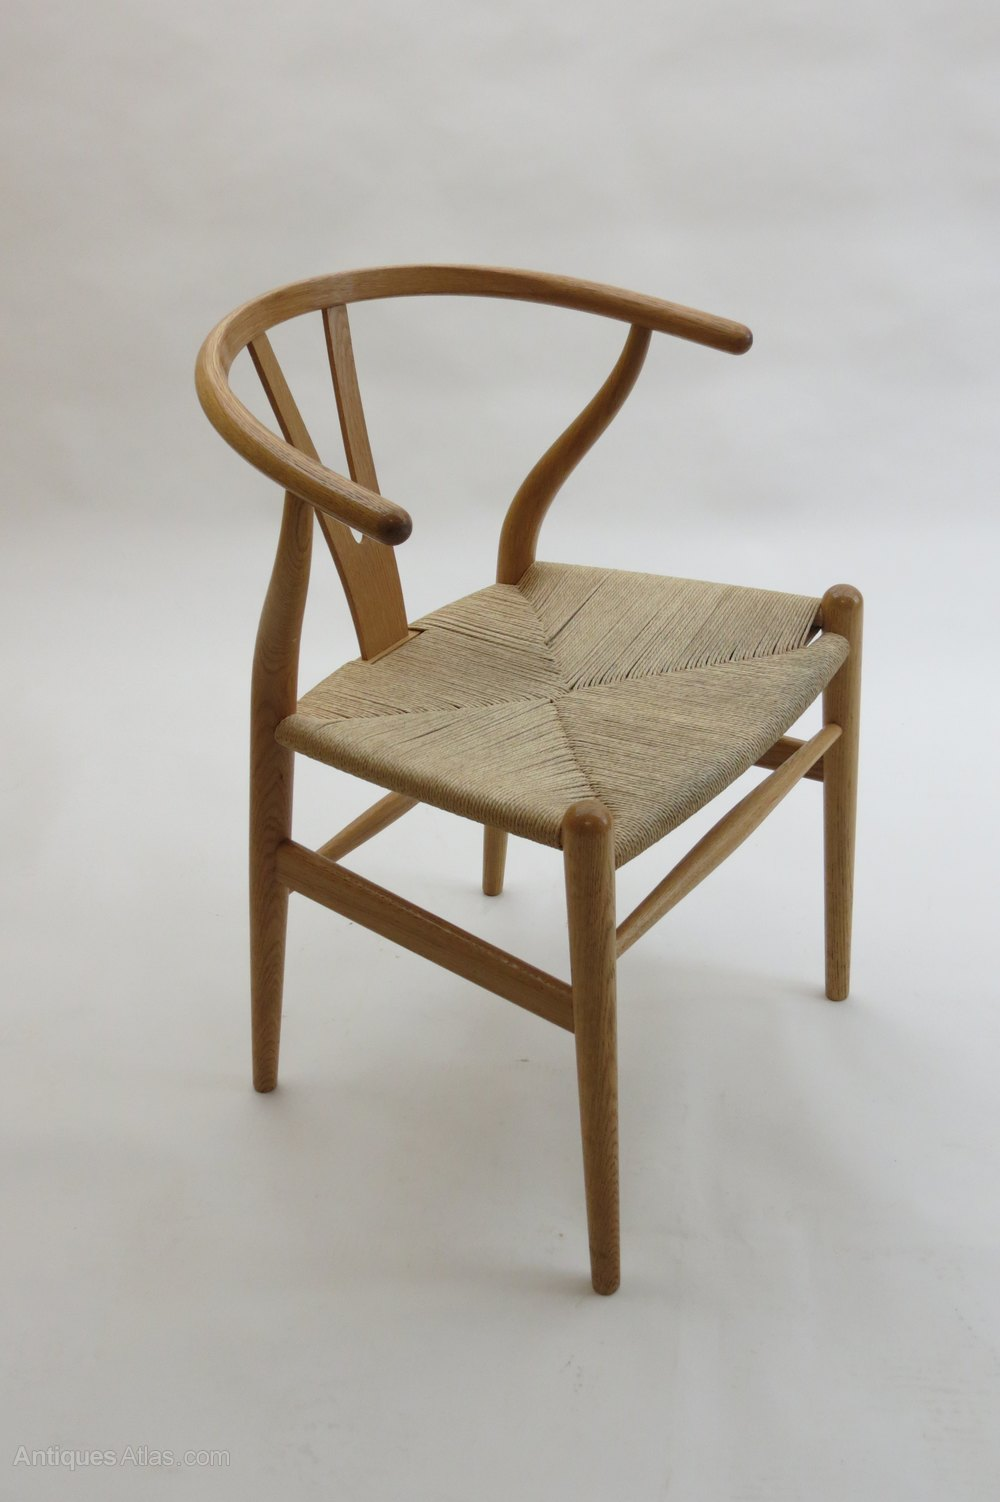 antiques atlas hans wegner wishbone chair in oak. Black Bedroom Furniture Sets. Home Design Ideas